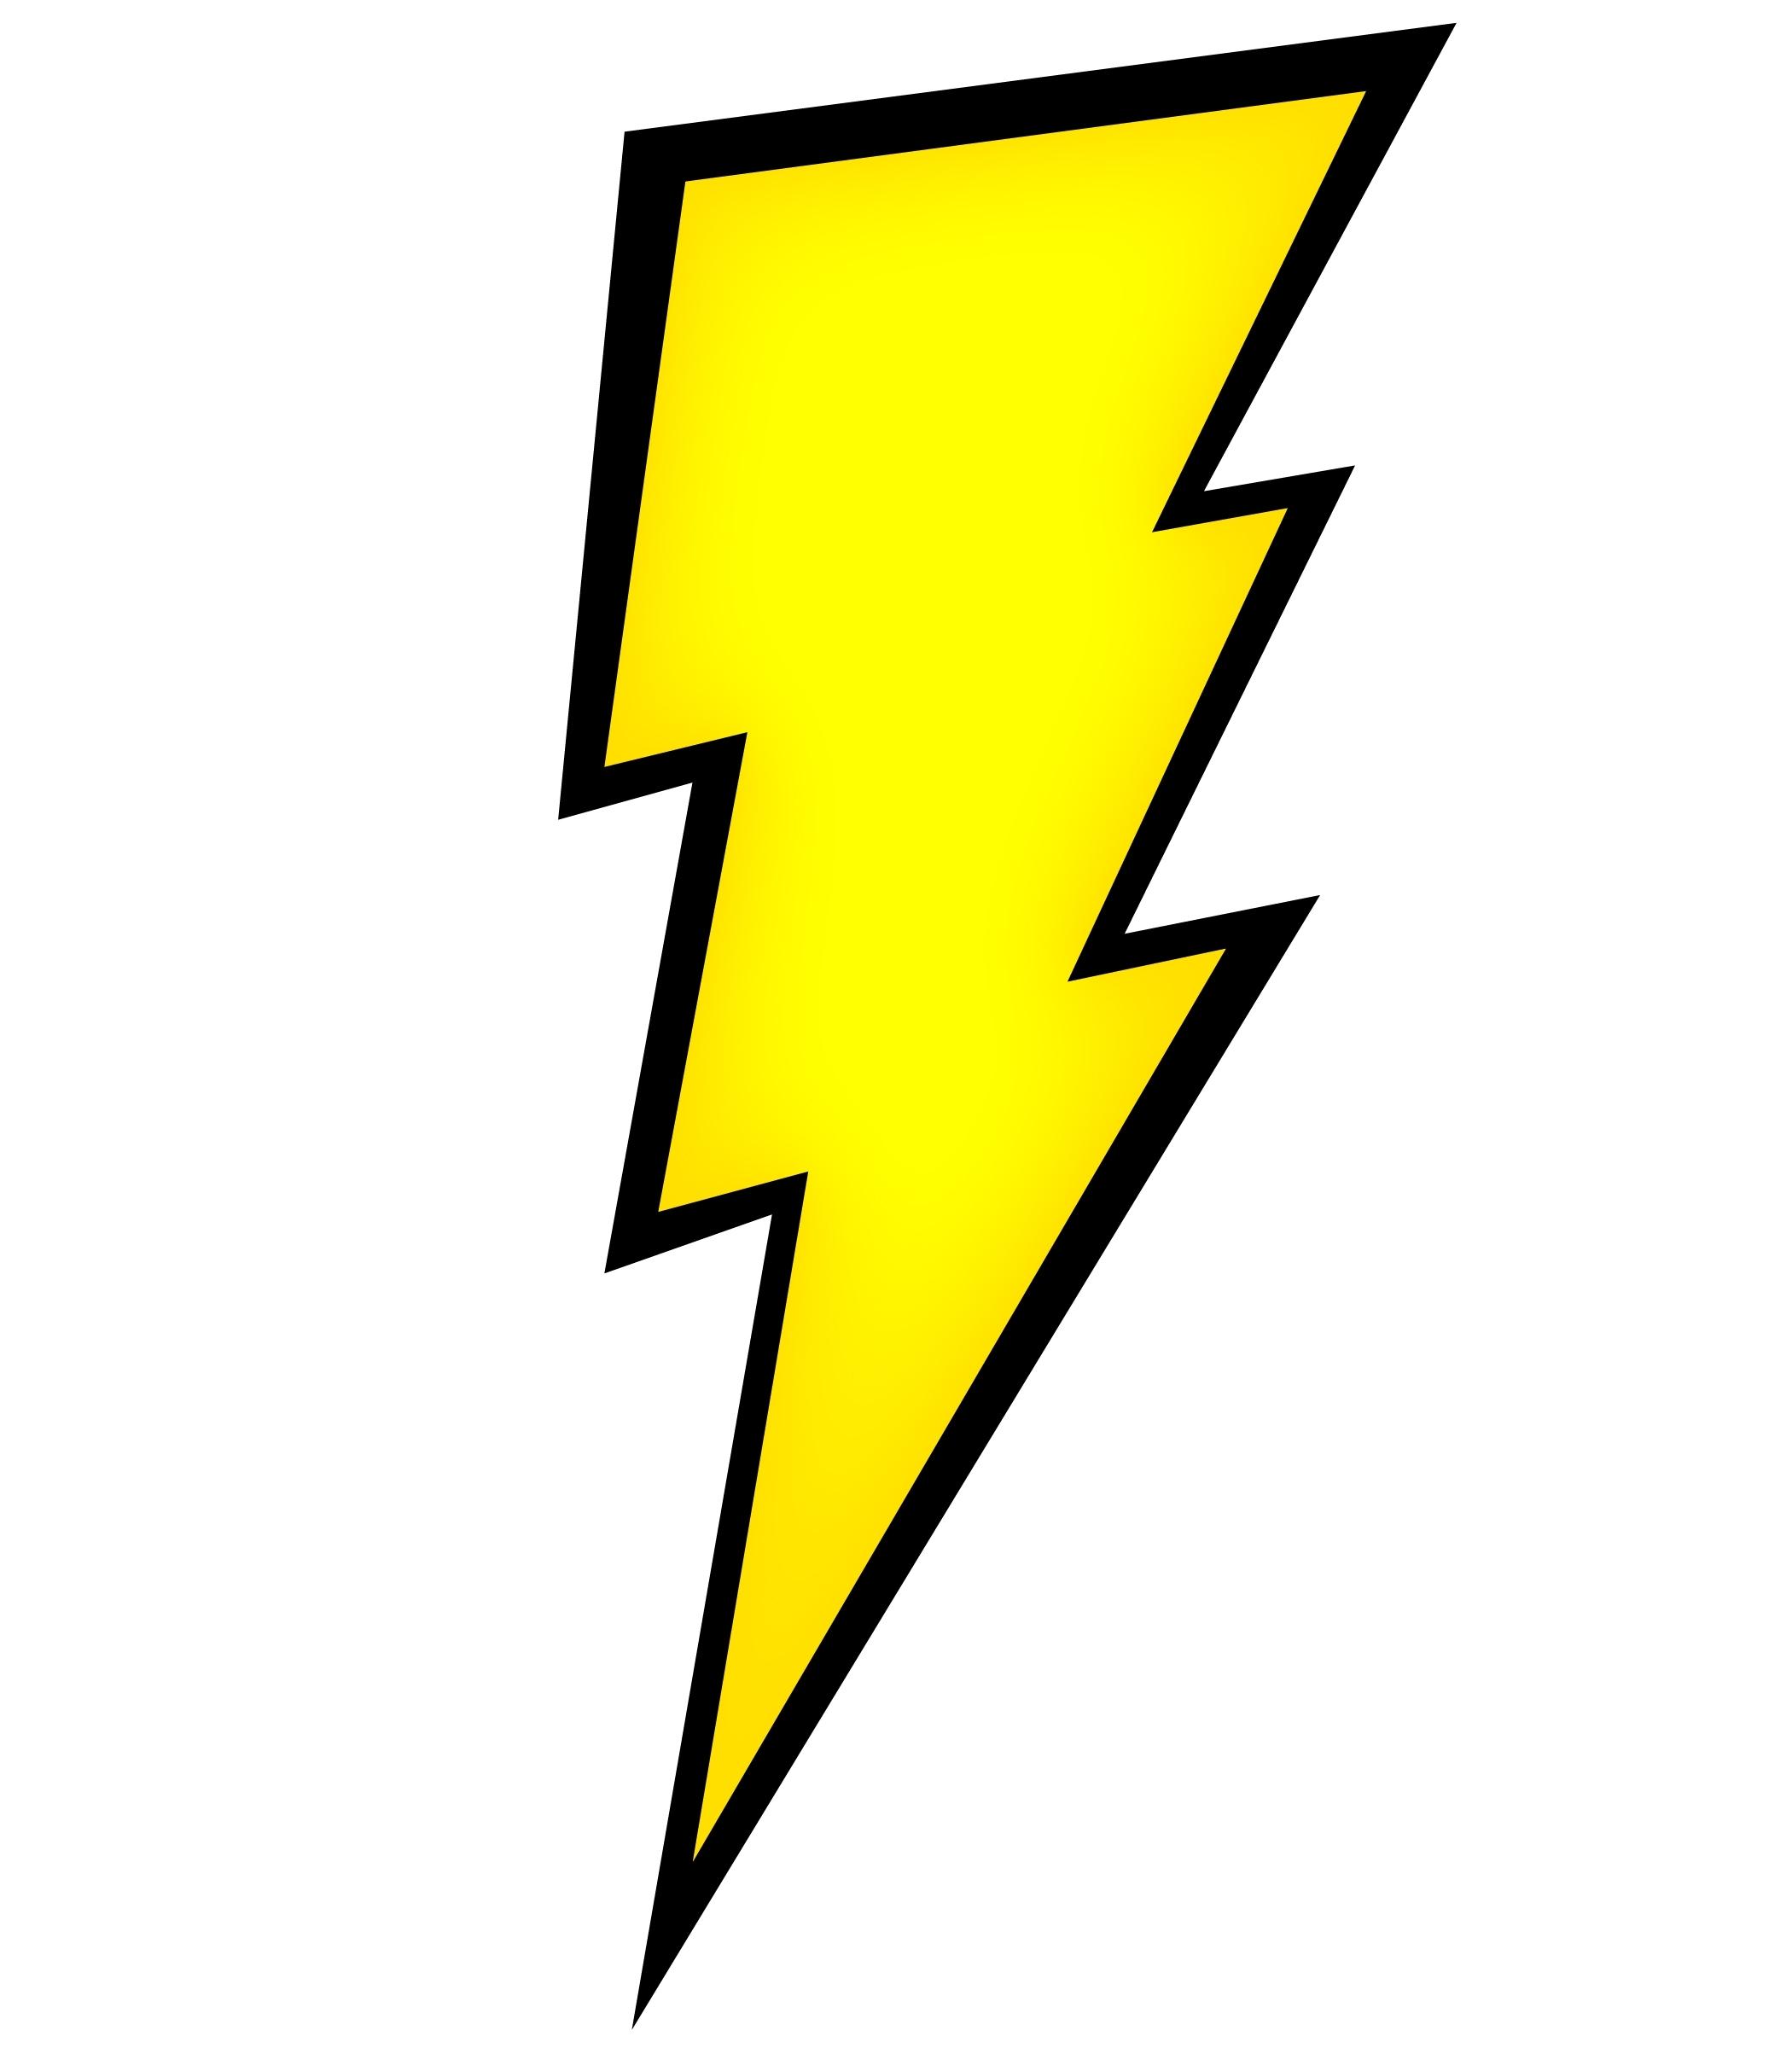 Electricity clipart Clipart Electric Clipart clipart Electric